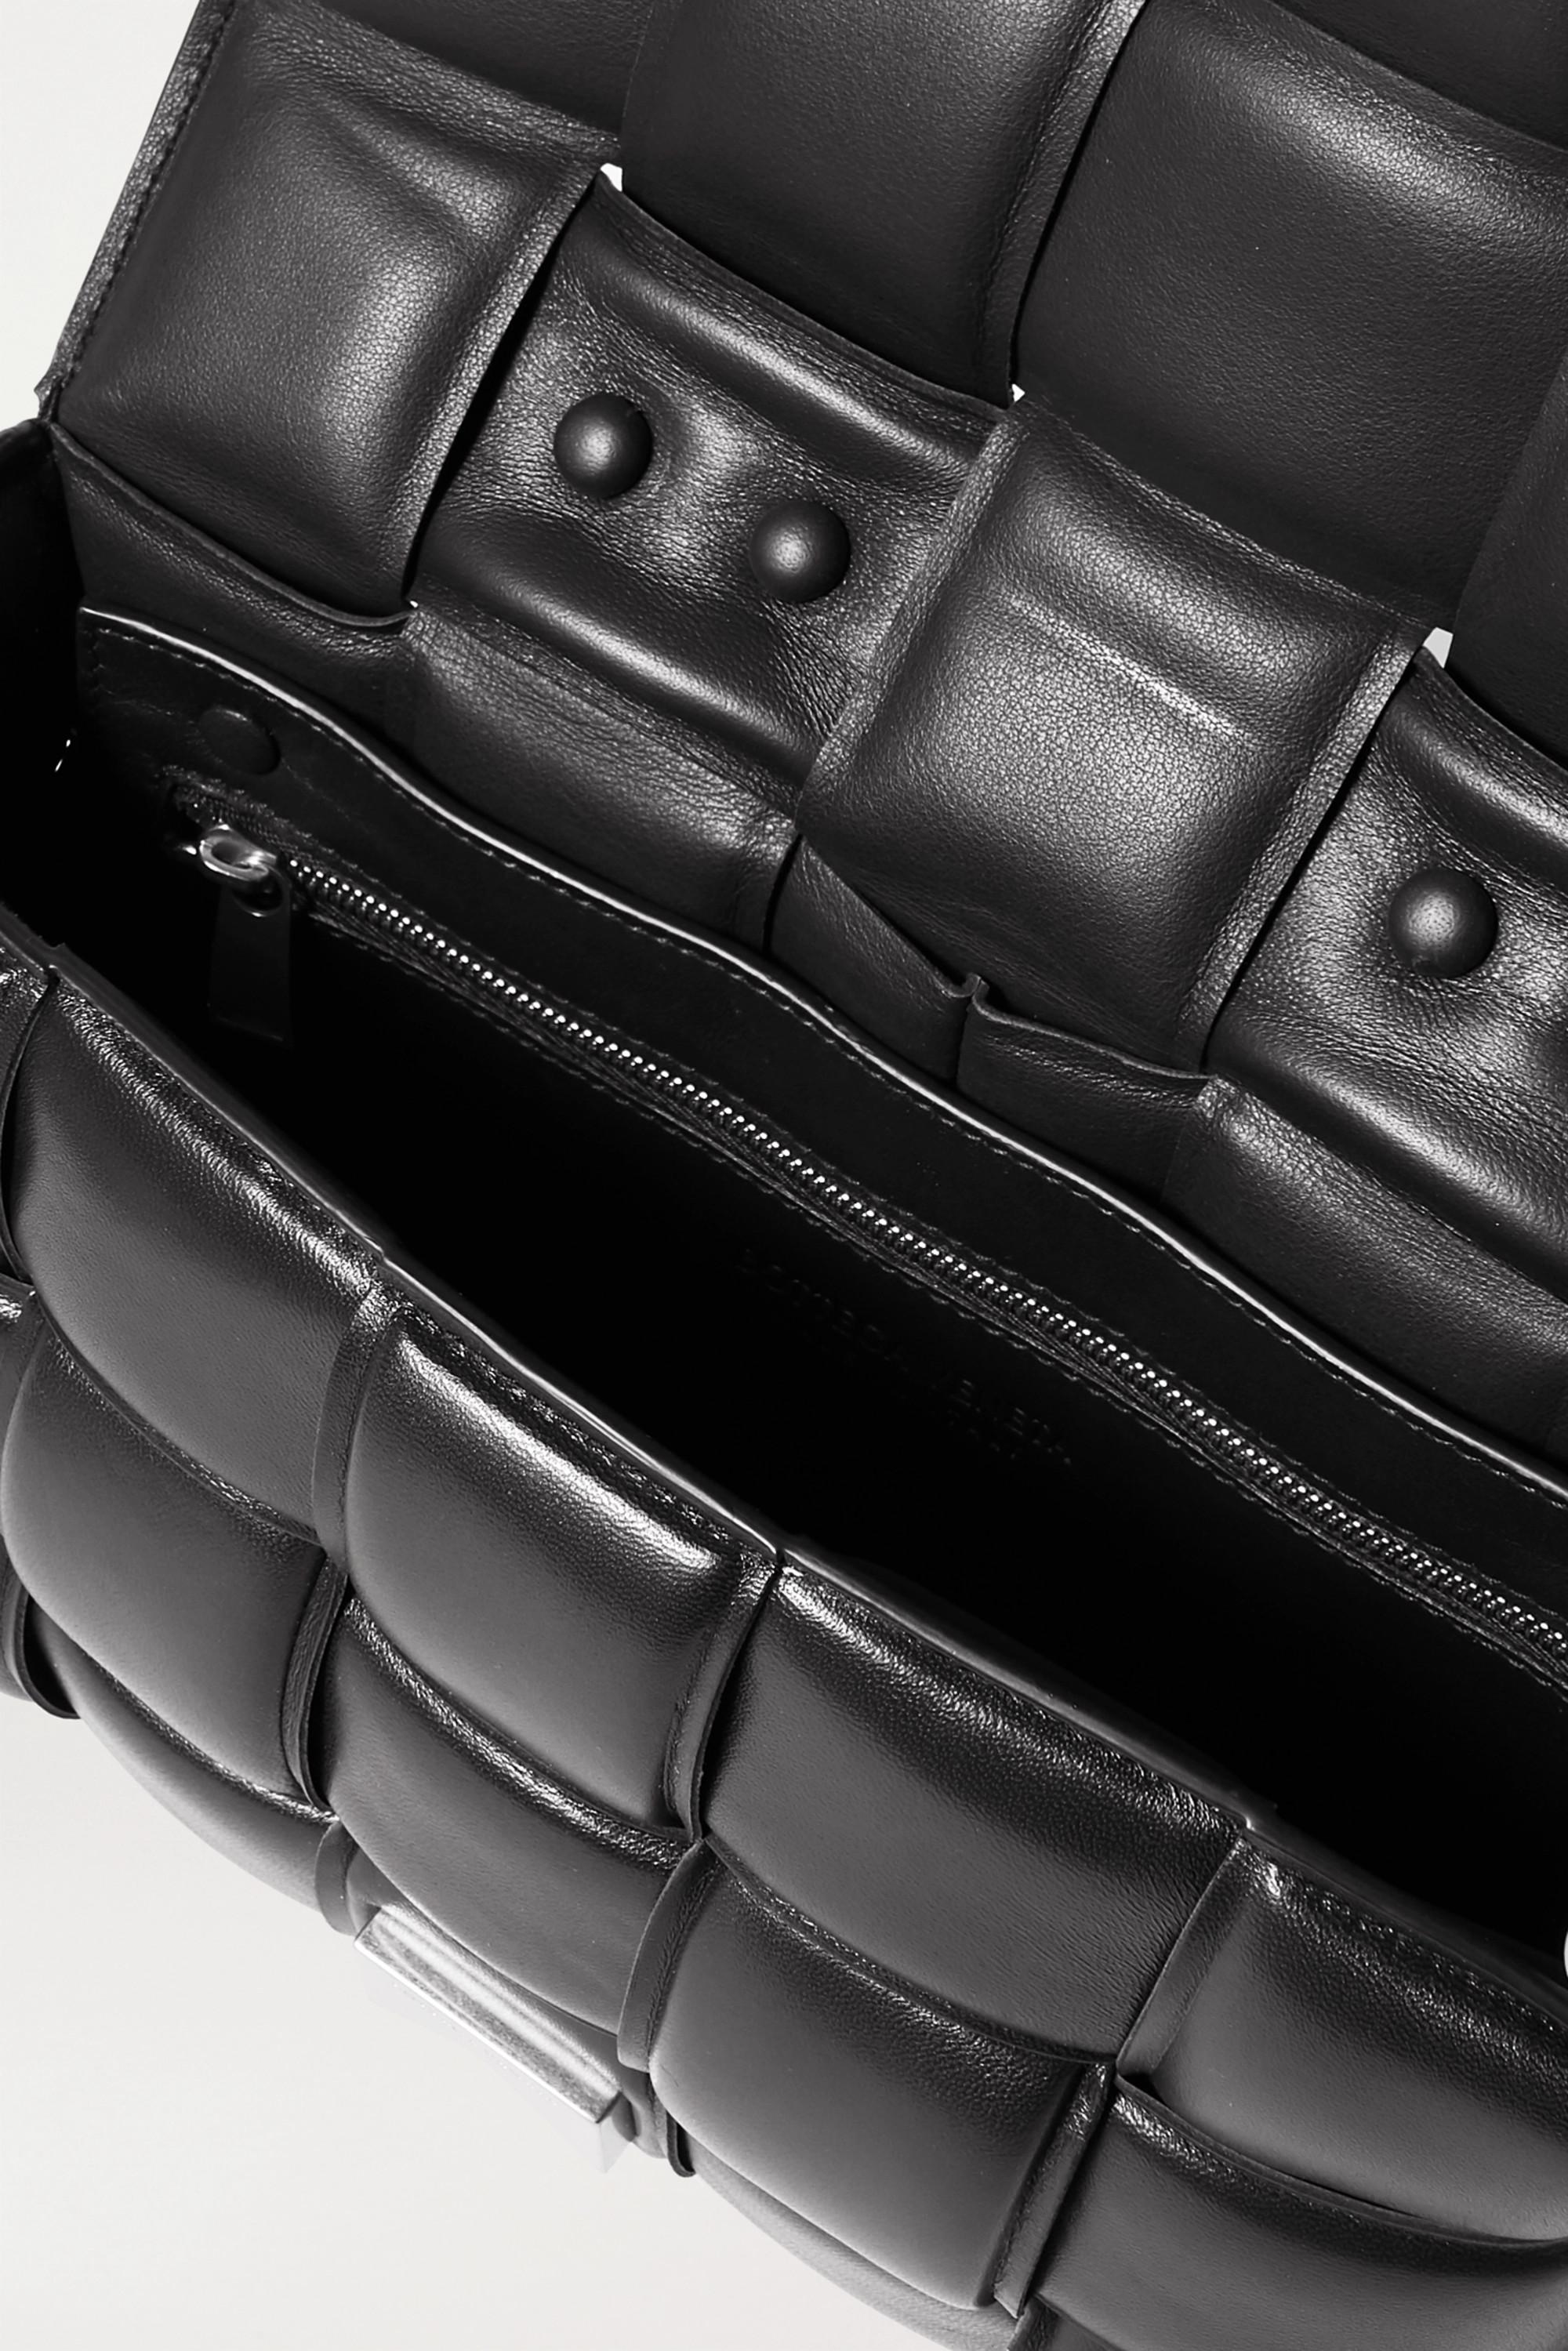 Bottega Veneta Cassette Schultertasche aus gepolstertem Intrecciato-Leder mit Kette